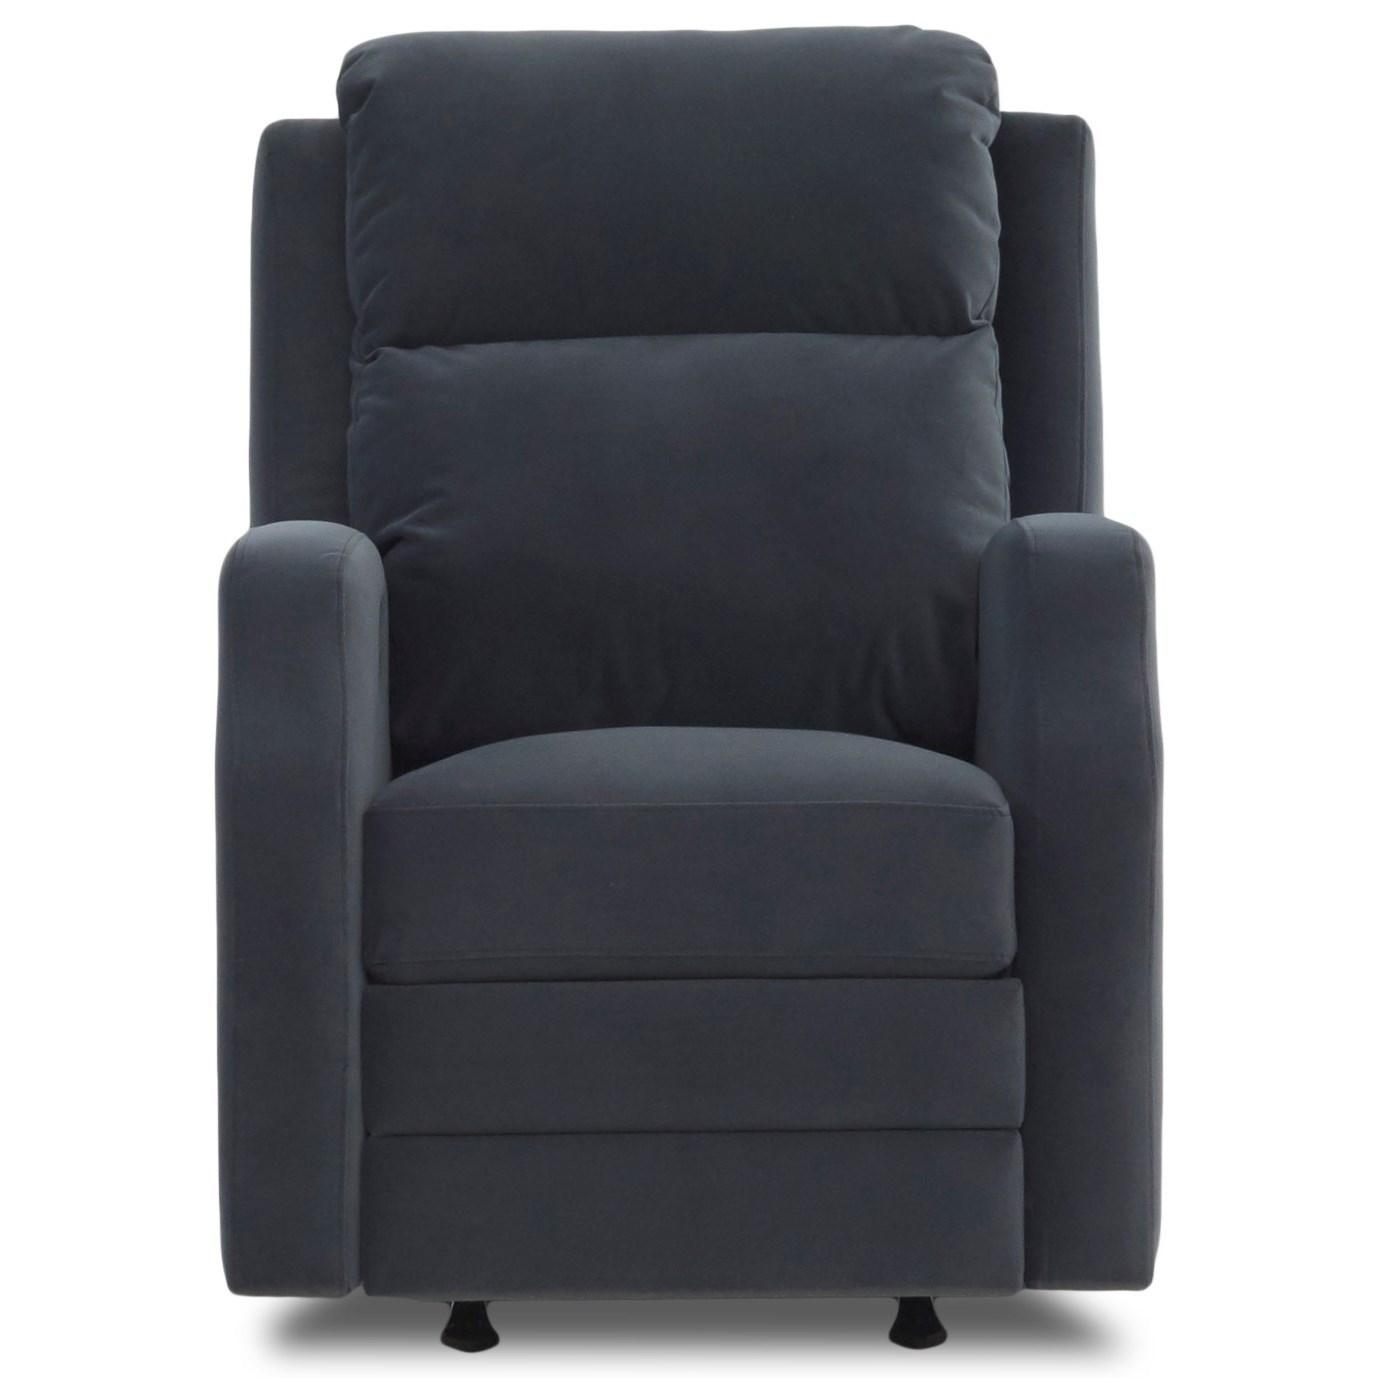 Kamiah Power Reclining Chair w/ Pwr Headrest by Klaussner at Lapeer Furniture & Mattress Center